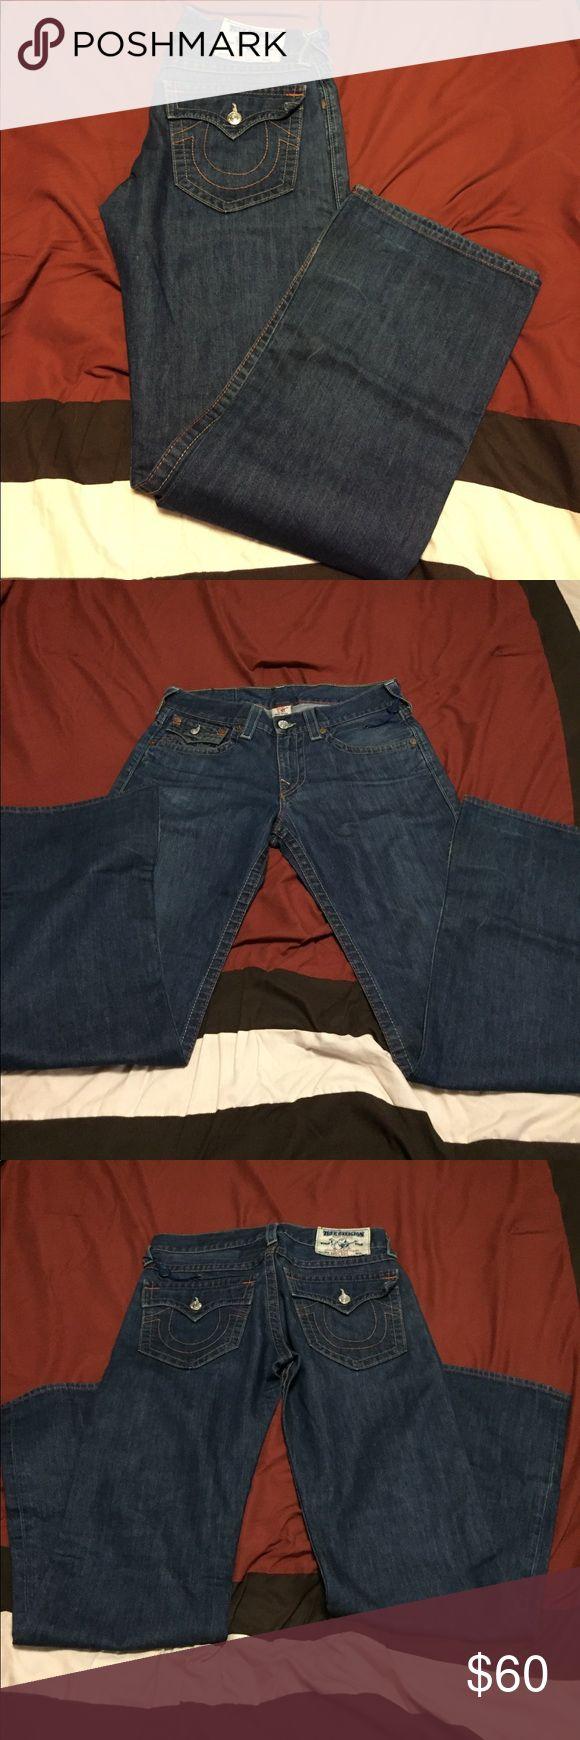 True Religion jeans True Religion jeans bootcut %100 authentic size:32 True Religion Jeans Bootcut